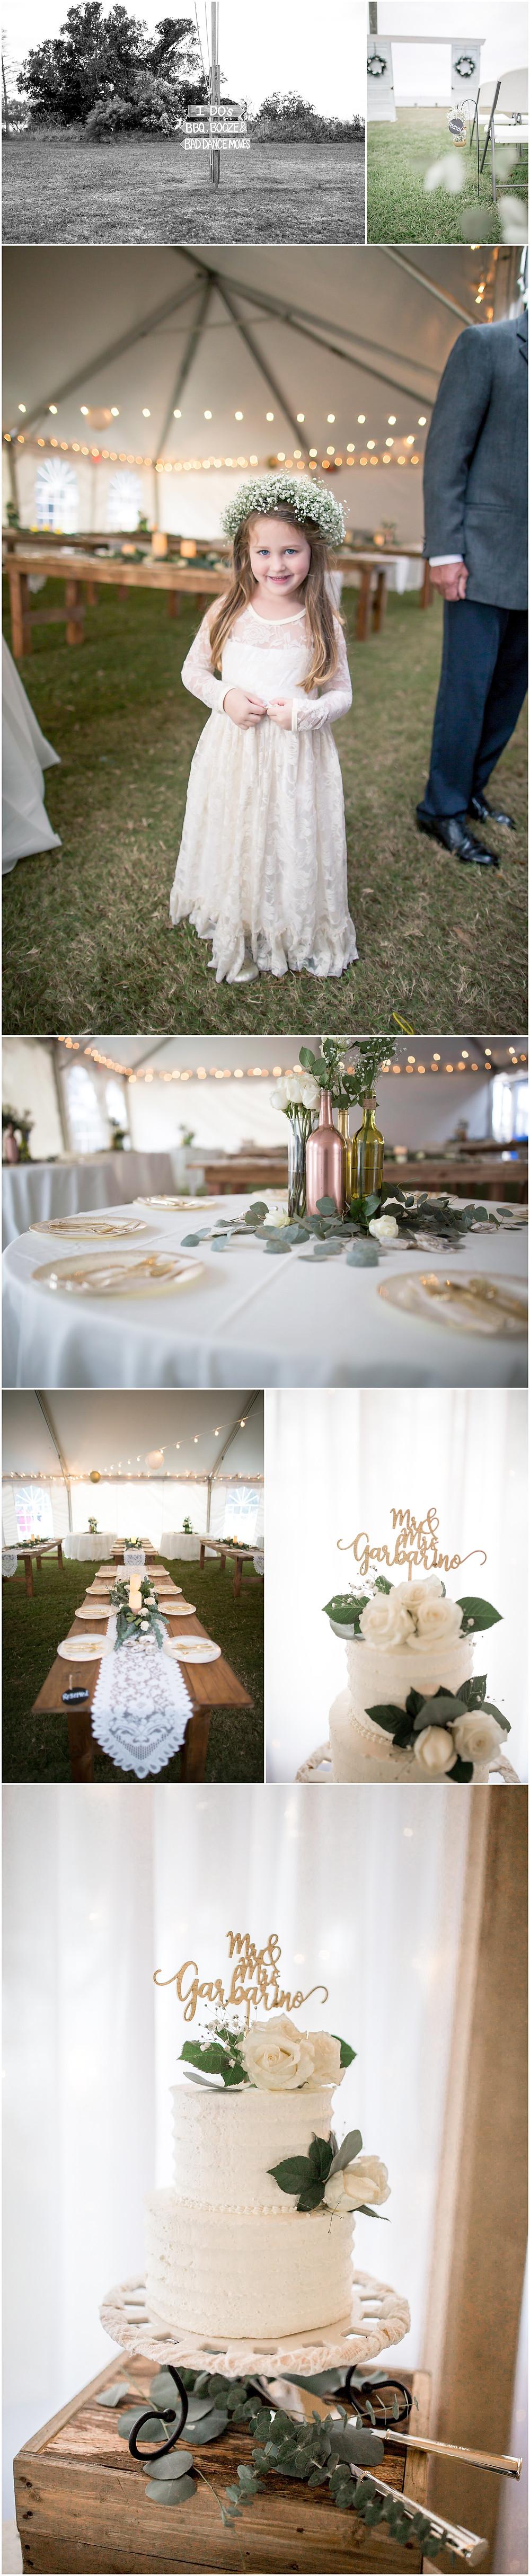 Wedding signs, Flower Girl, Wedding Cake, North Carolina Wedding